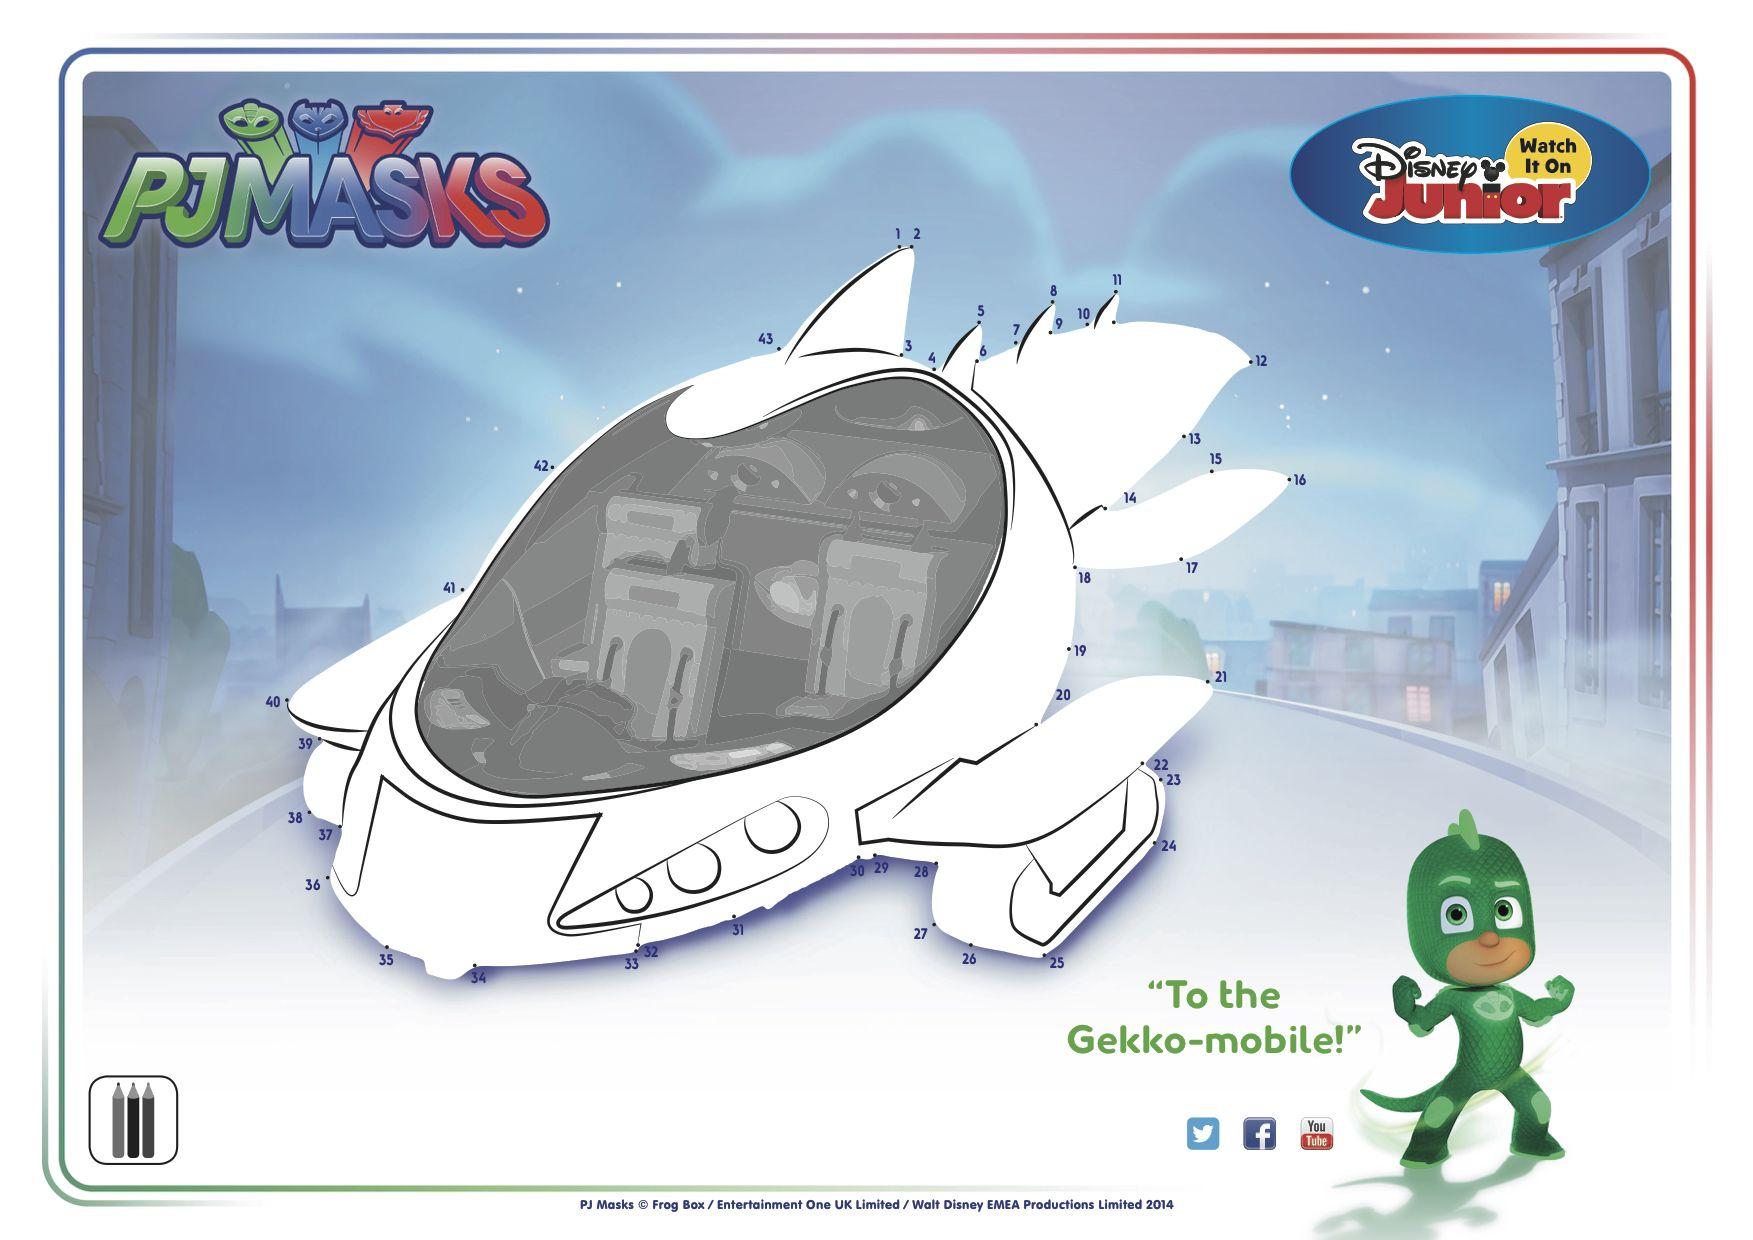 To The Gekko Mobile Pjmasks Gekko Disneyjunior Ideias Para Festas Festa Atividades